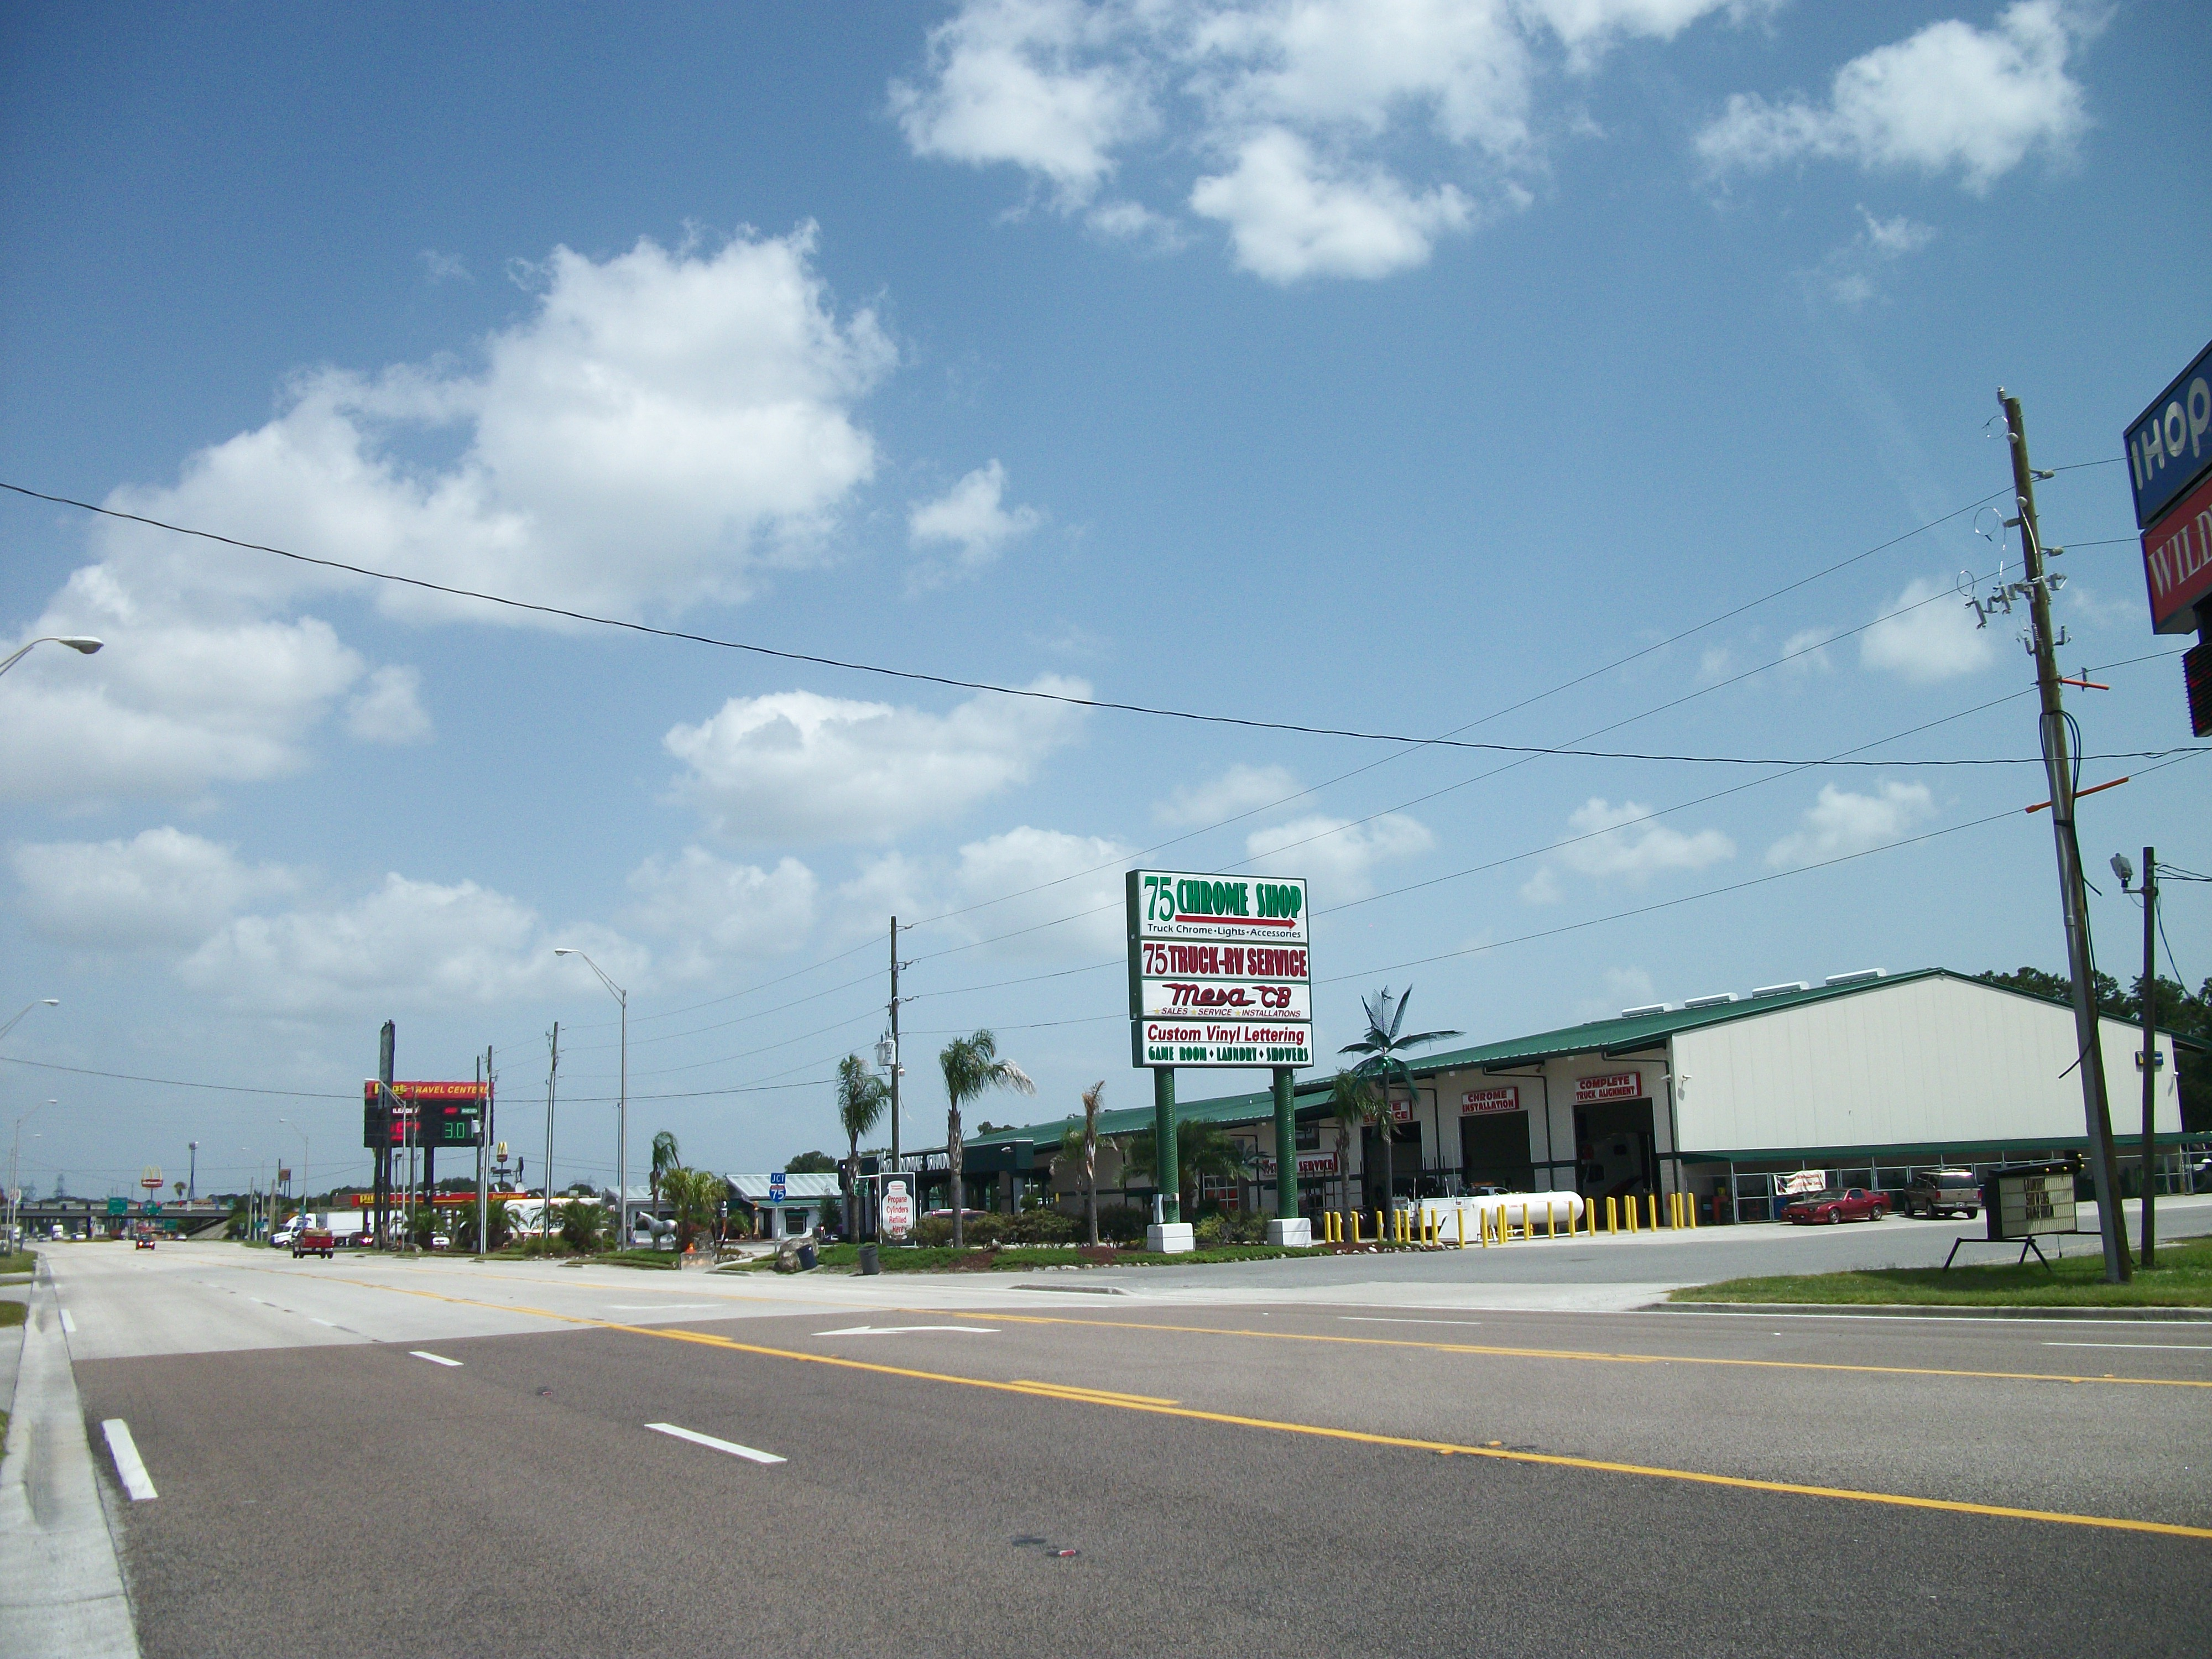 75 Chrome Shop >> File:75 Chrome Shop; Wildwood, FL.JPG - Wikimedia Commons